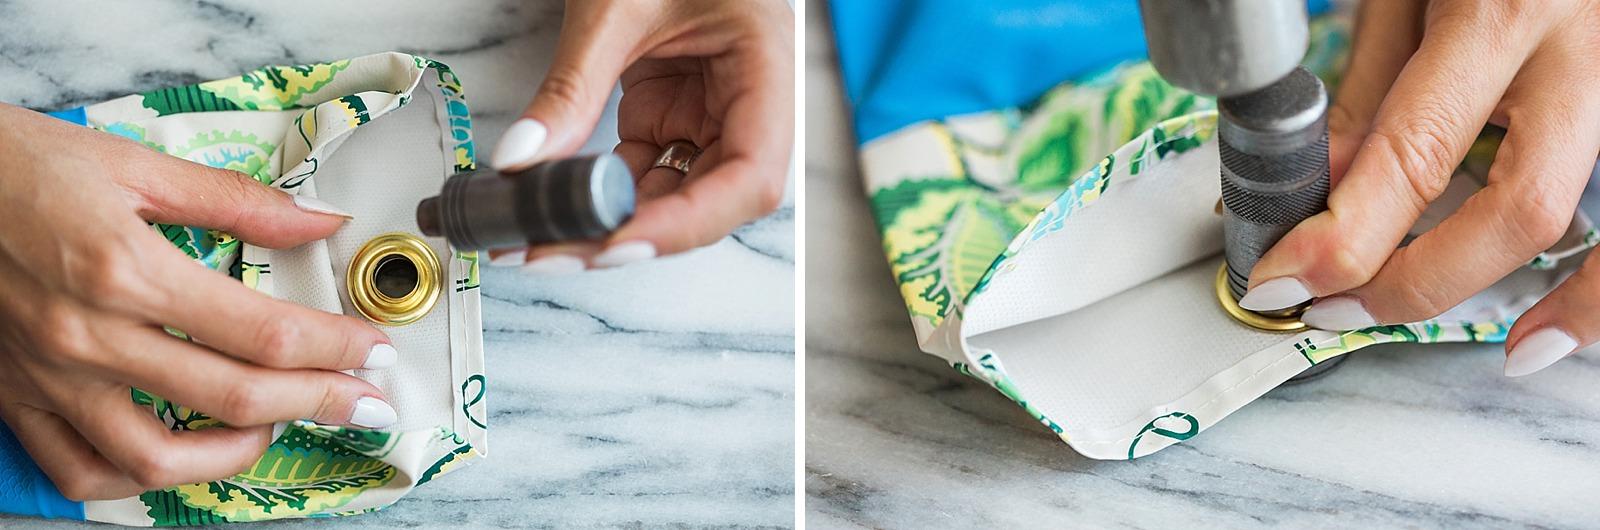 gloves-grommets-how-to-diy-kitchen-organization-338